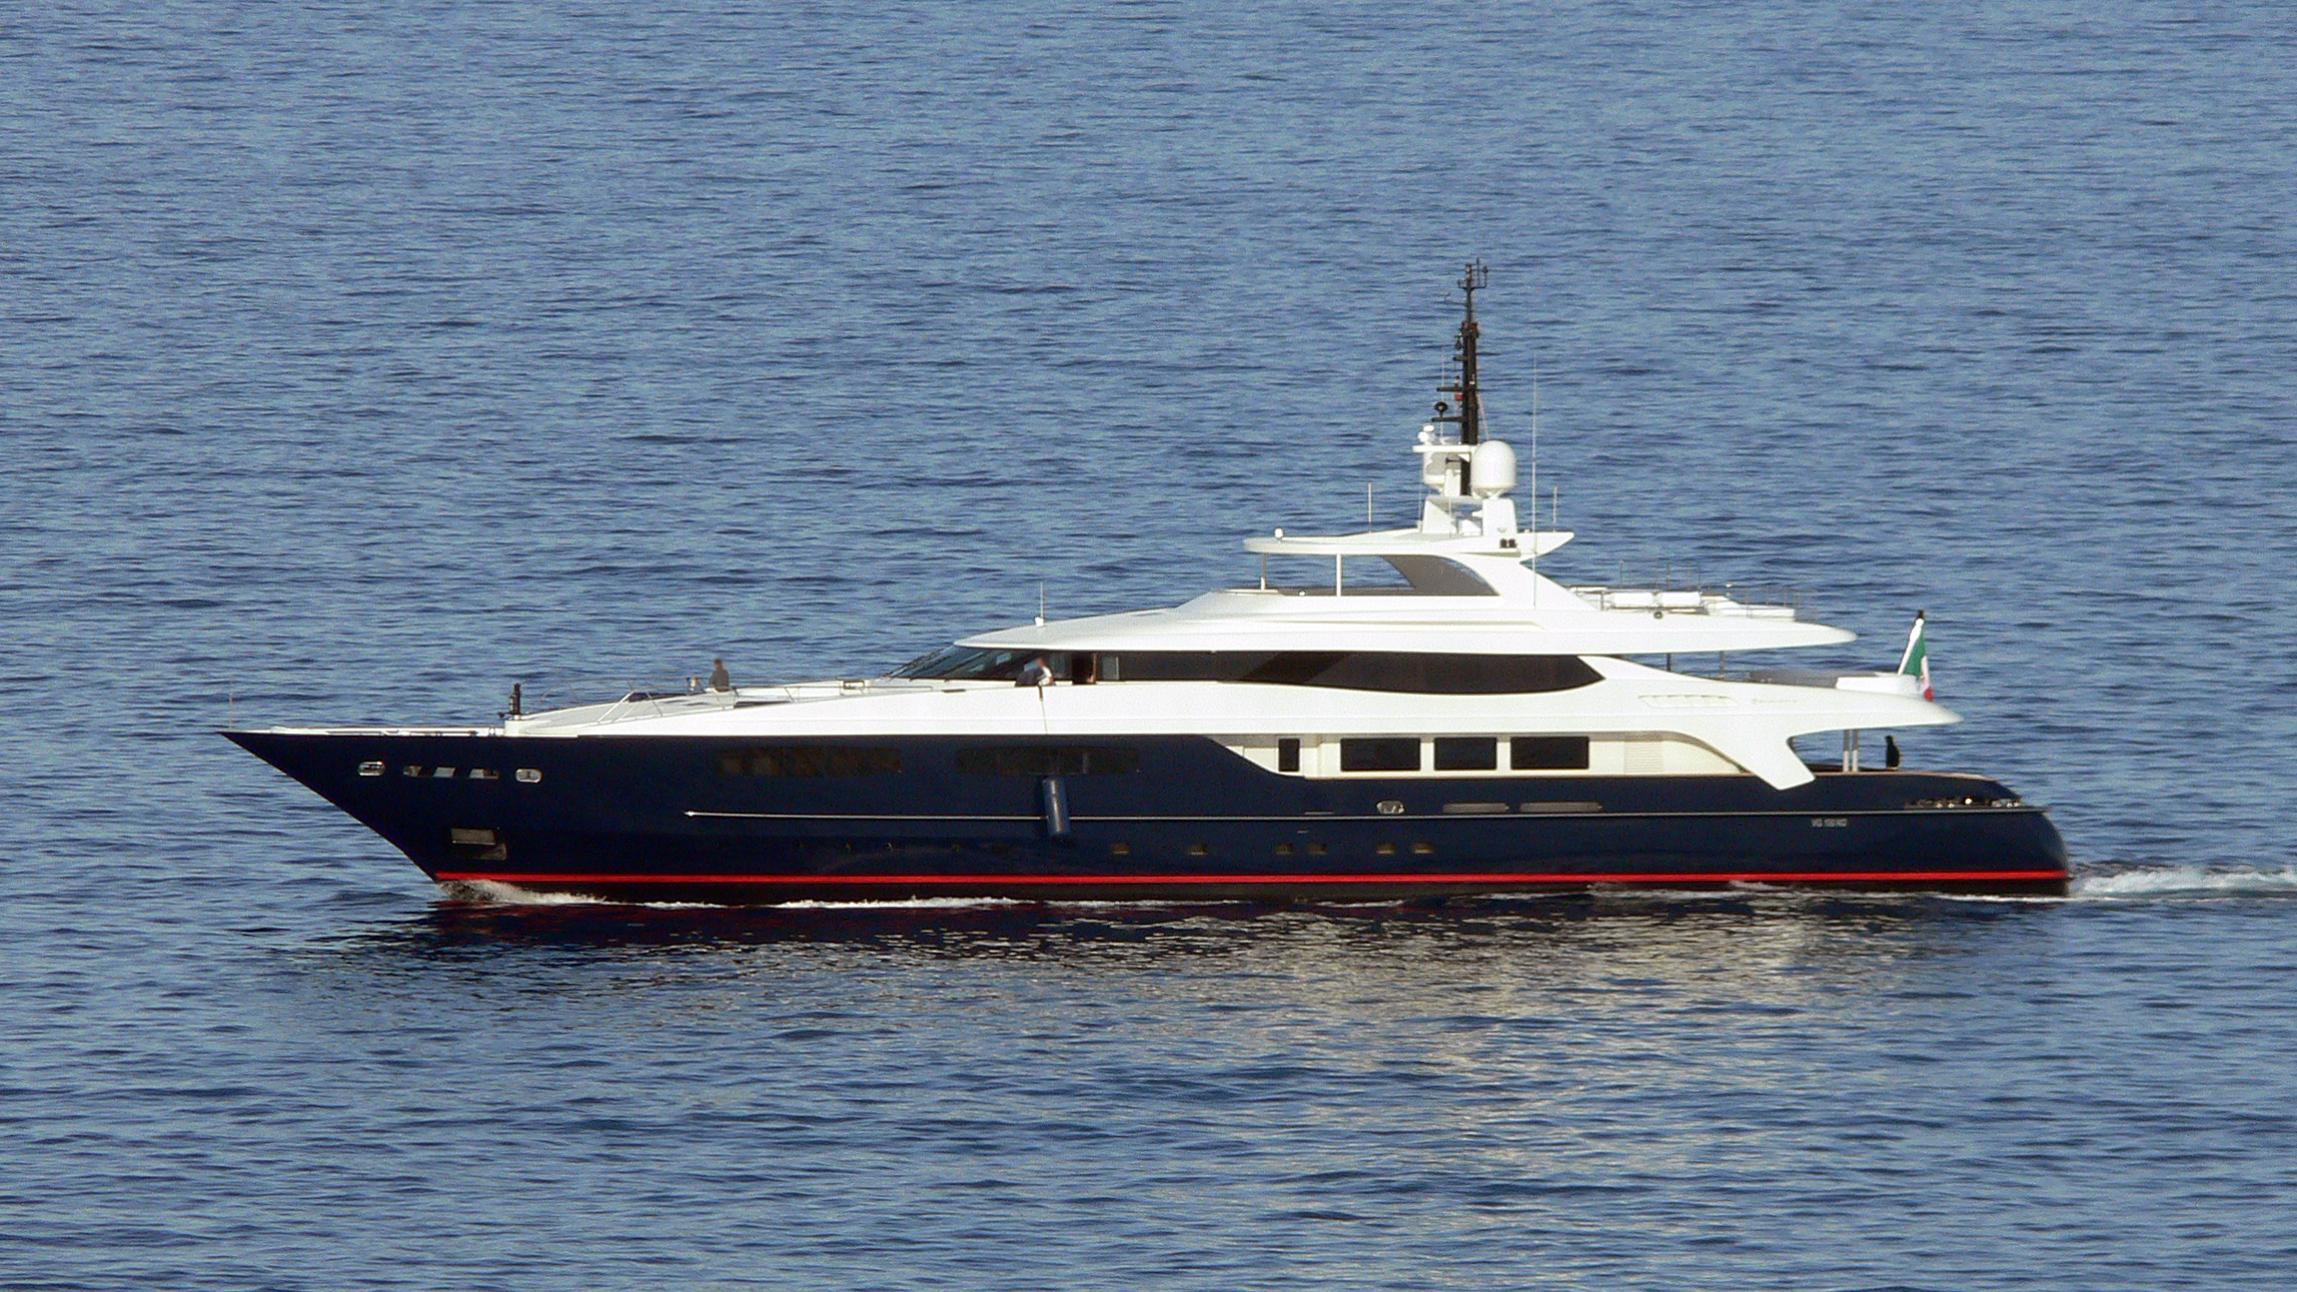 mischief-motor-yacht-baglietto-53m-2006-profile